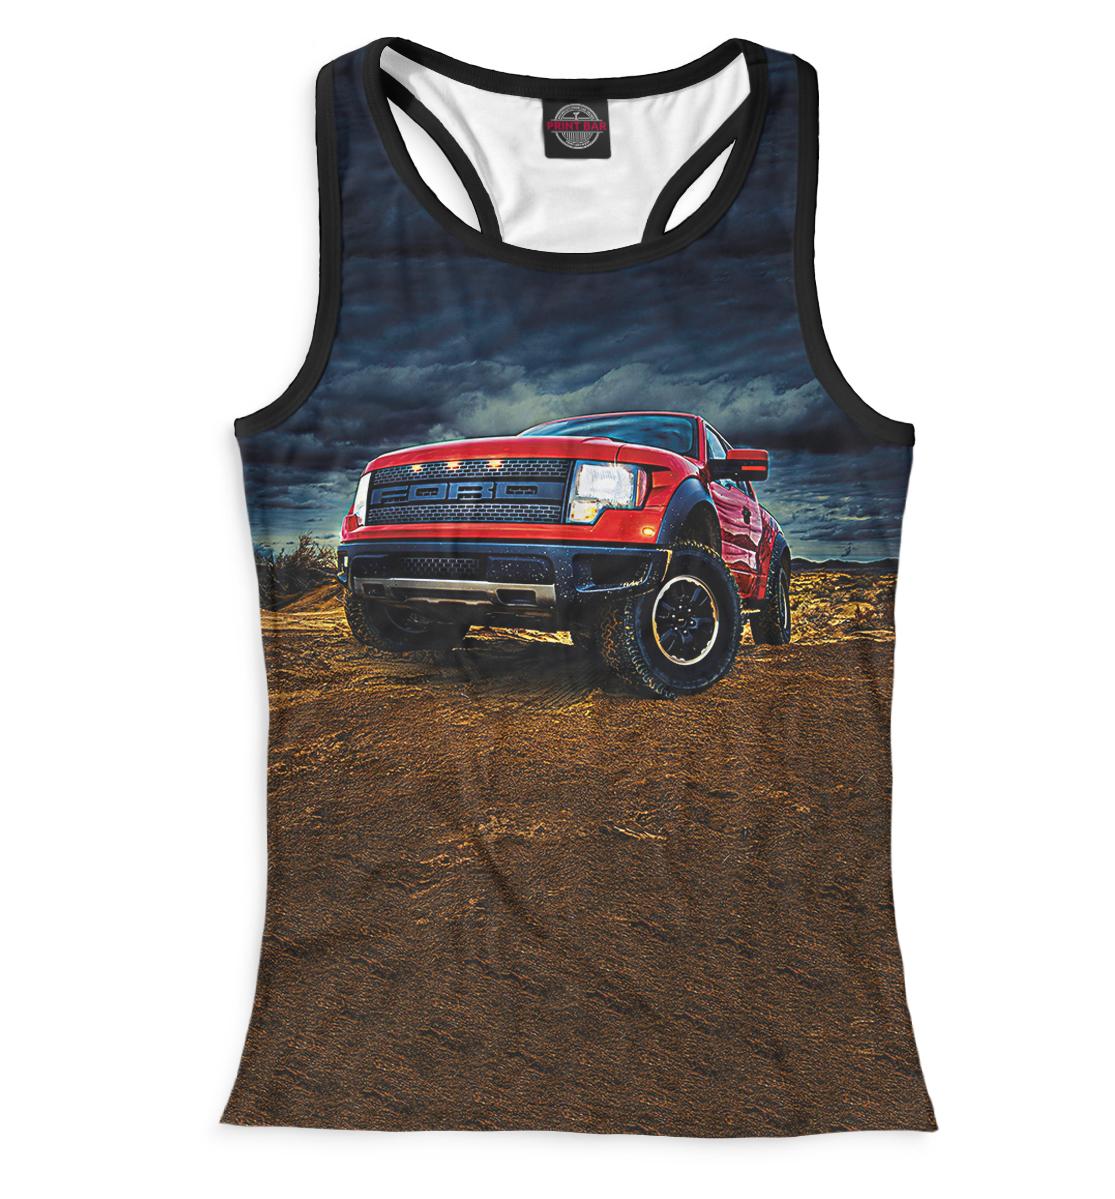 Купить Ford F-150 Raptor, Printbar, Майки борцовки, OUT-339408-mayb-1